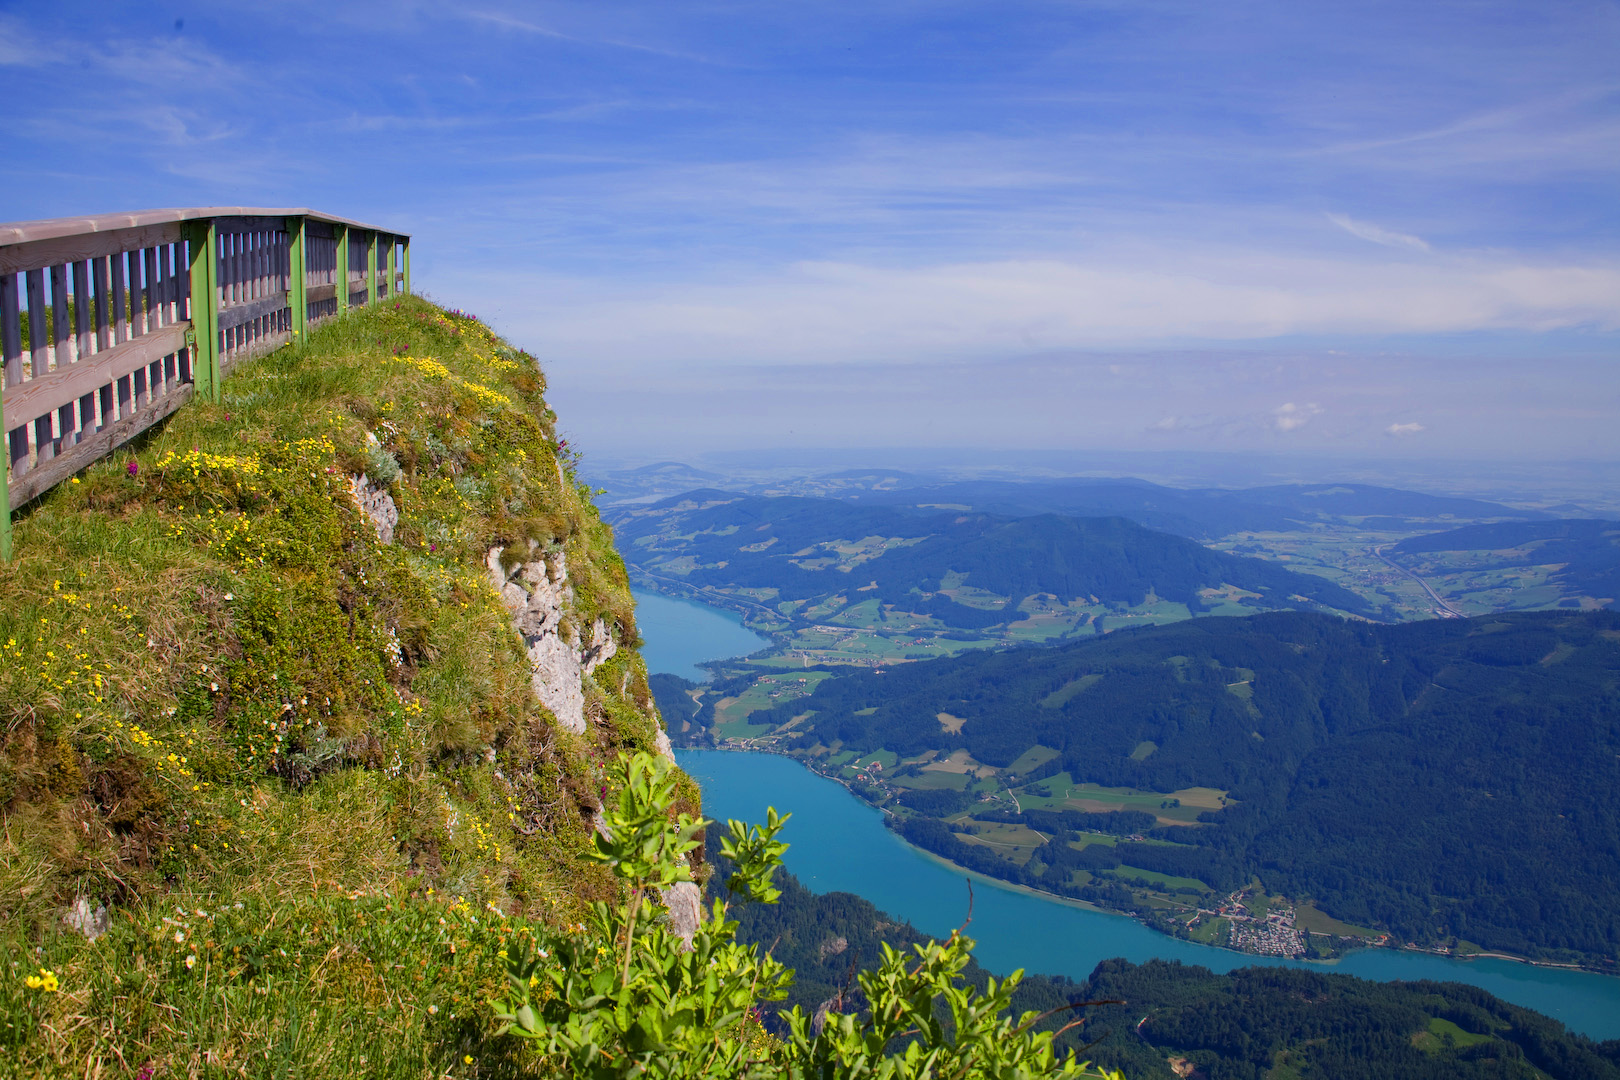 Austria by AustrianPictures